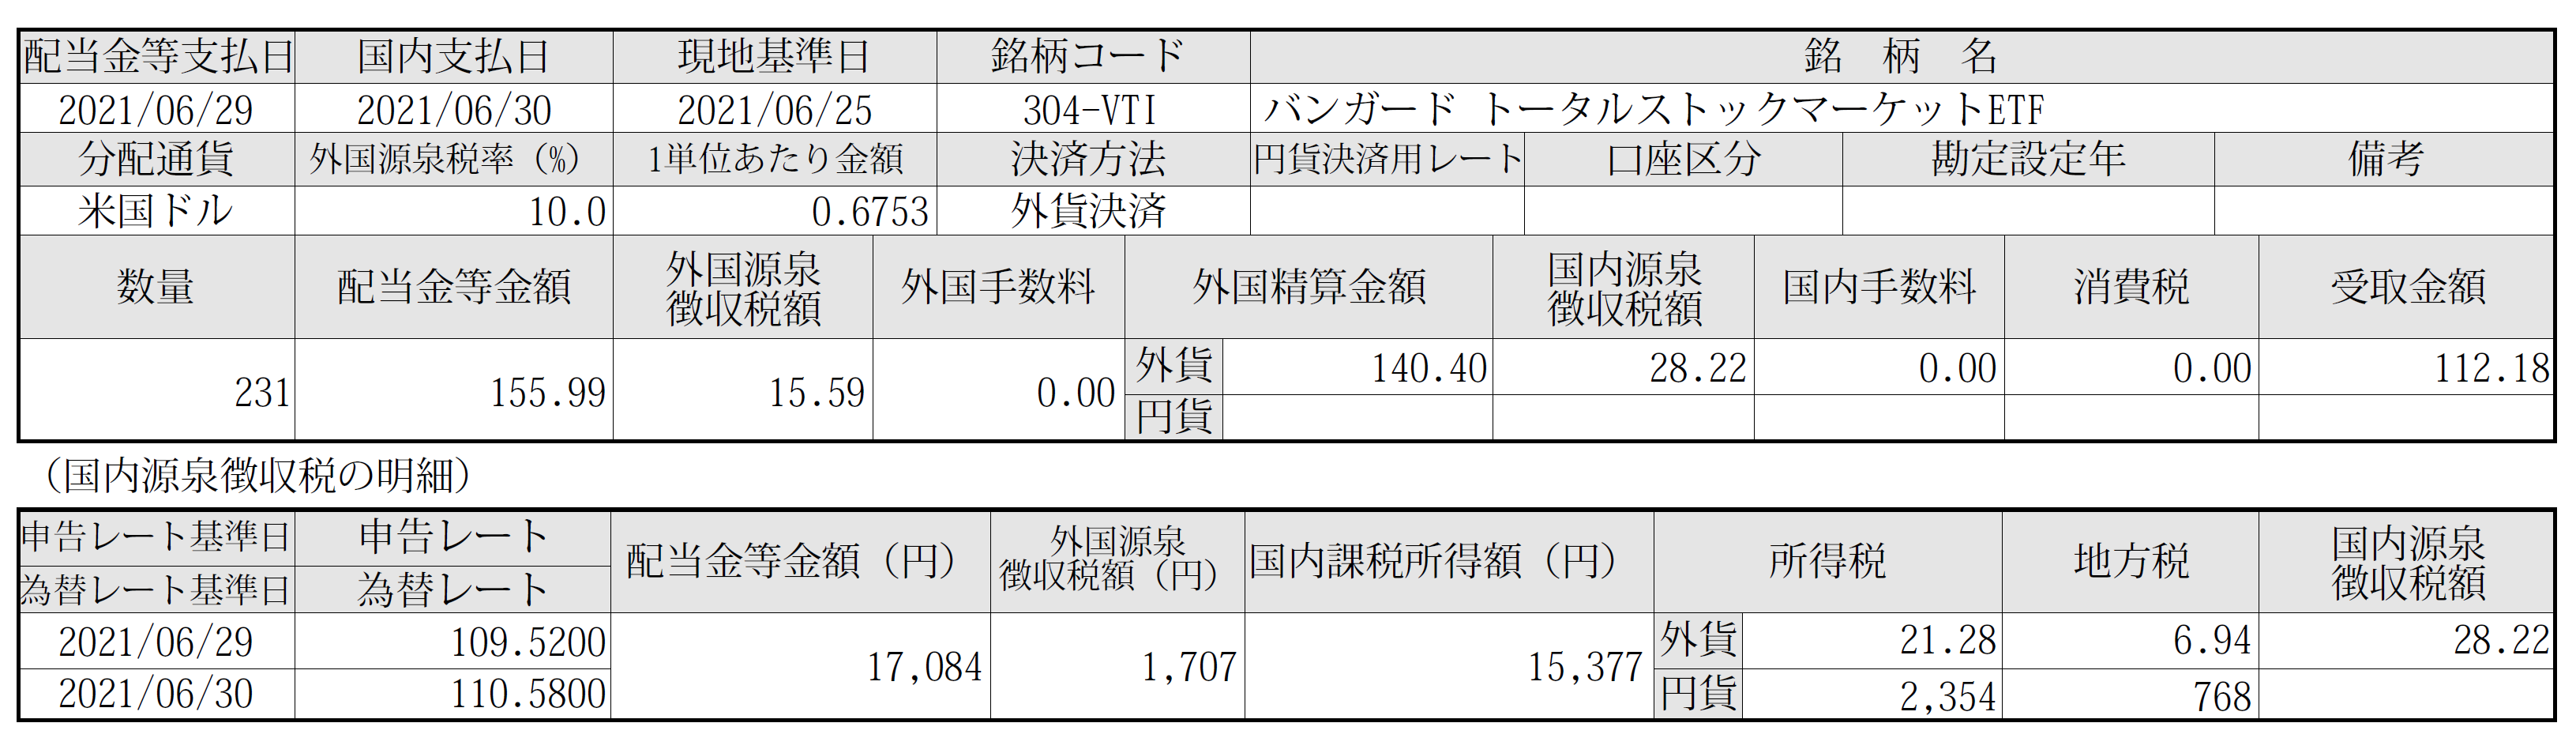 f:id:hodo-work:20210706193155p:plain